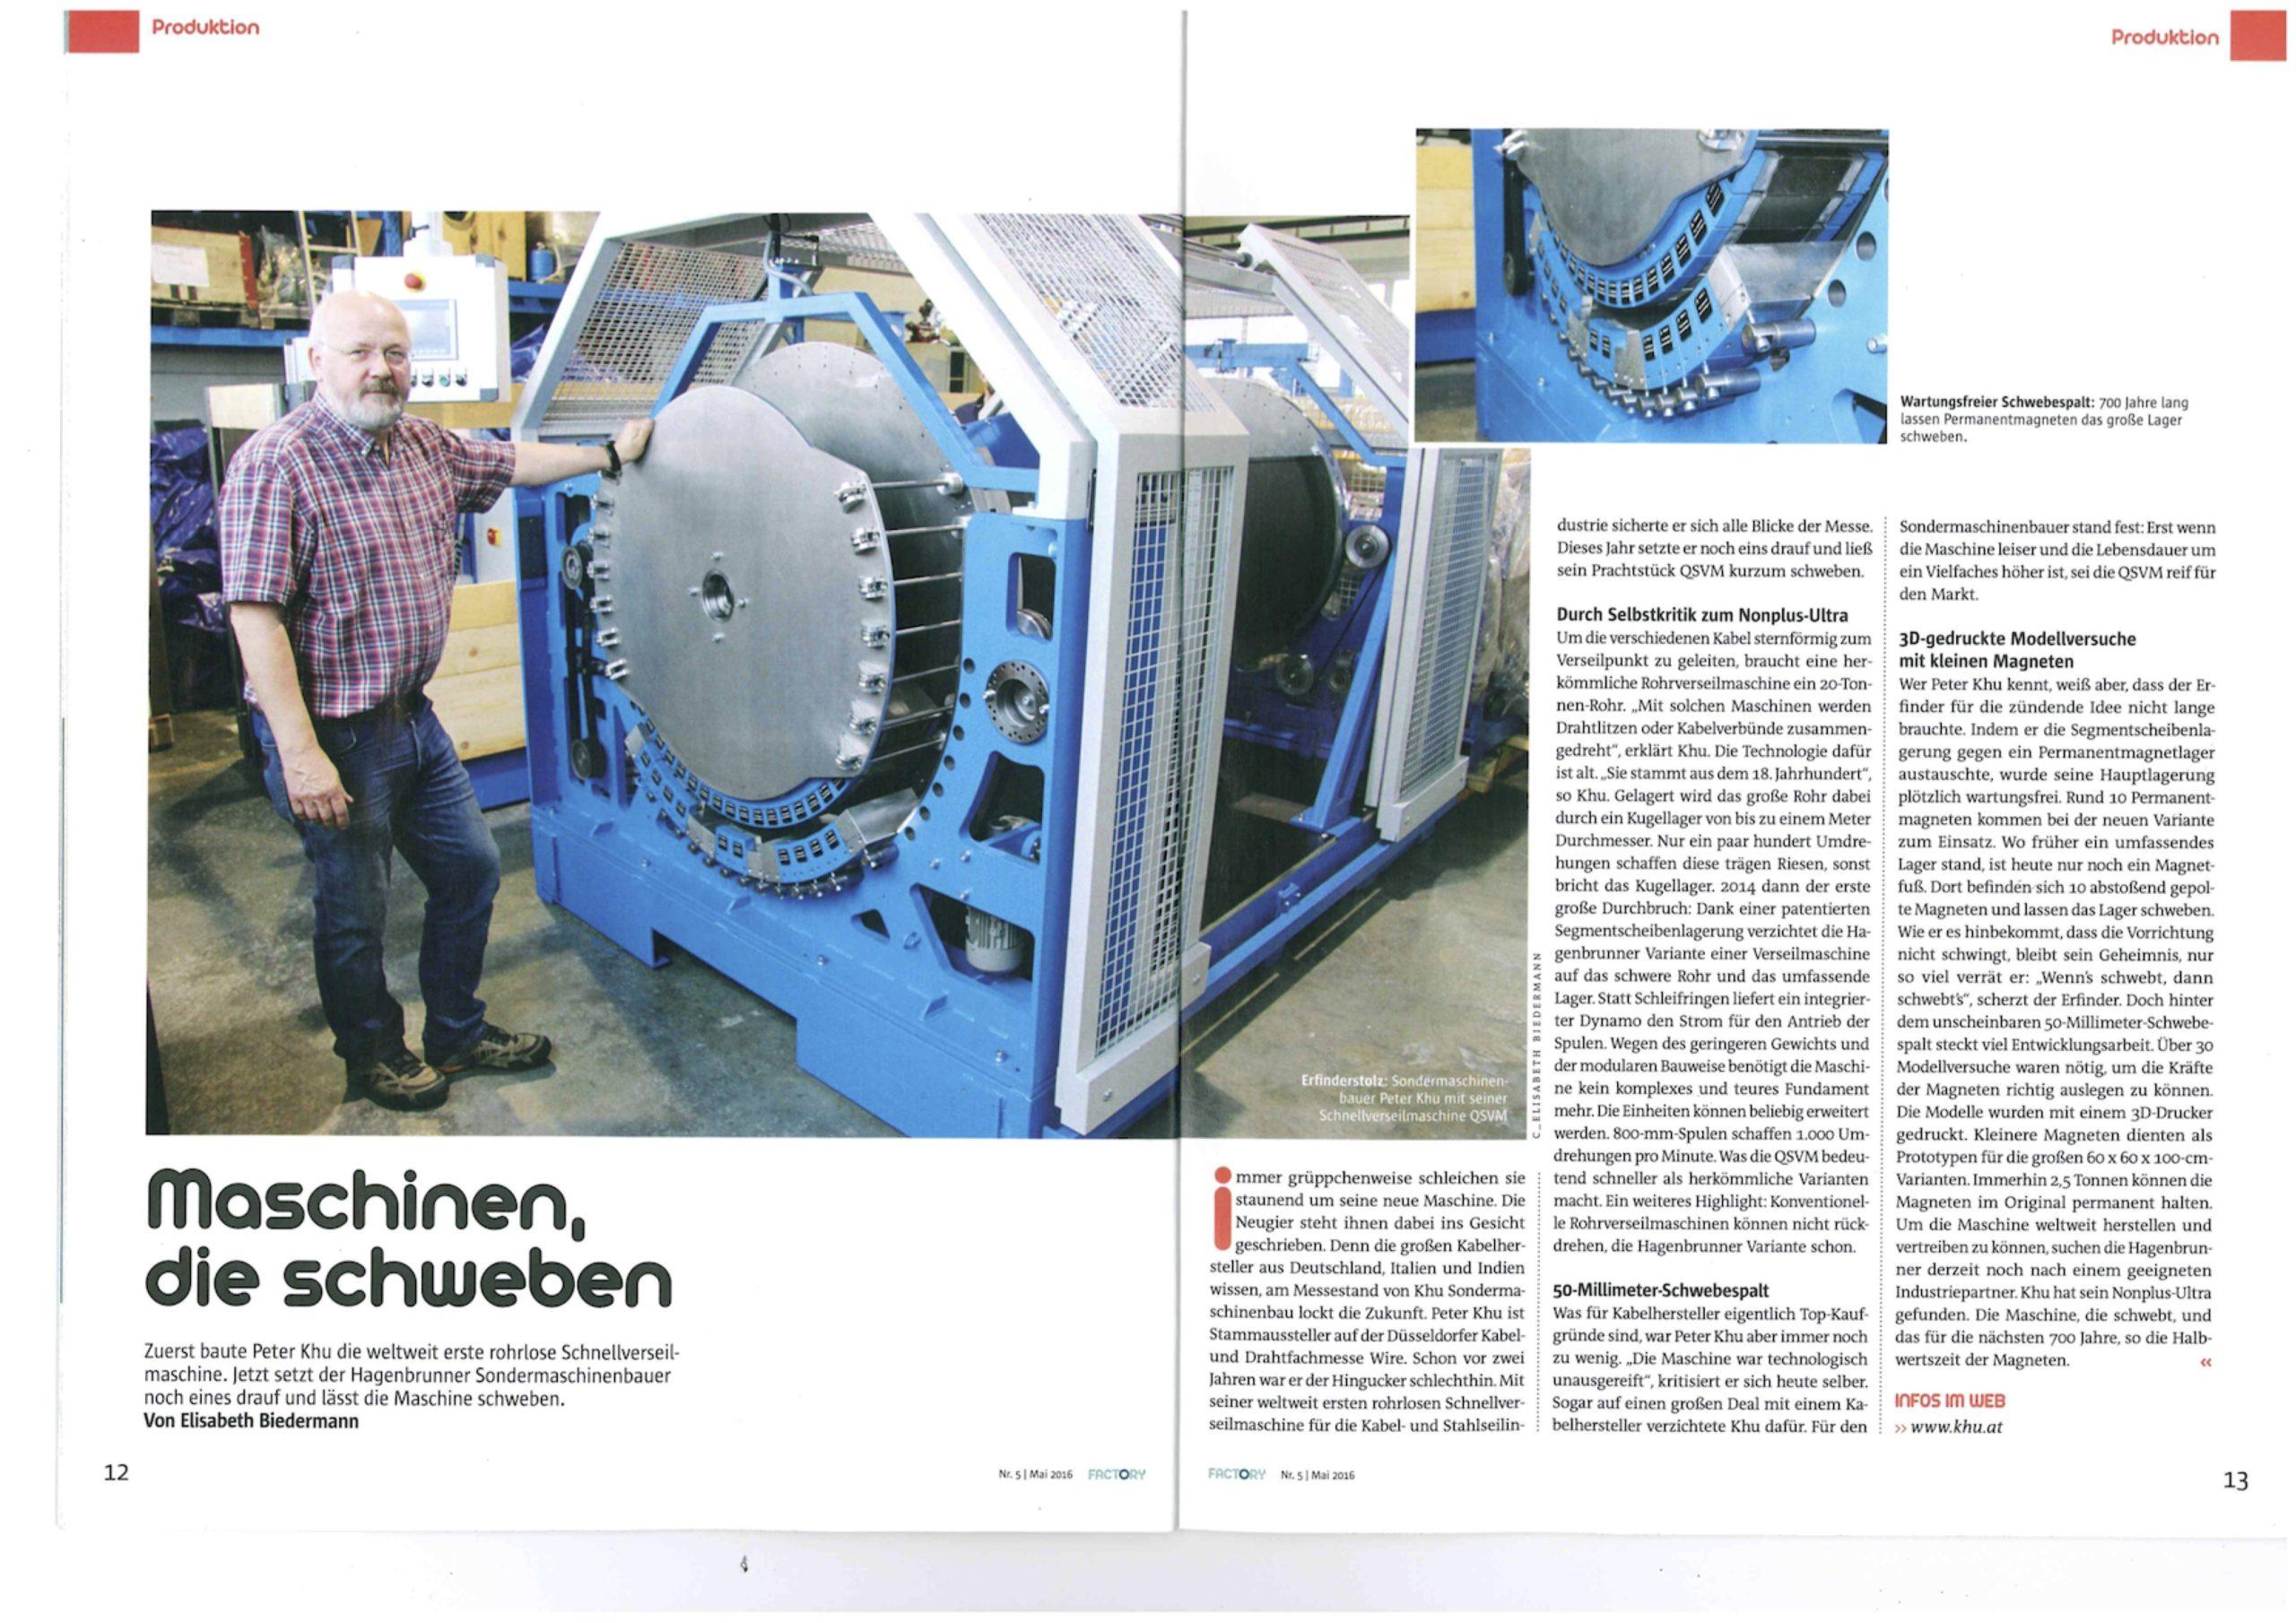 Factory Pressemeldung über KHU QSVM mit Magnetlagerung